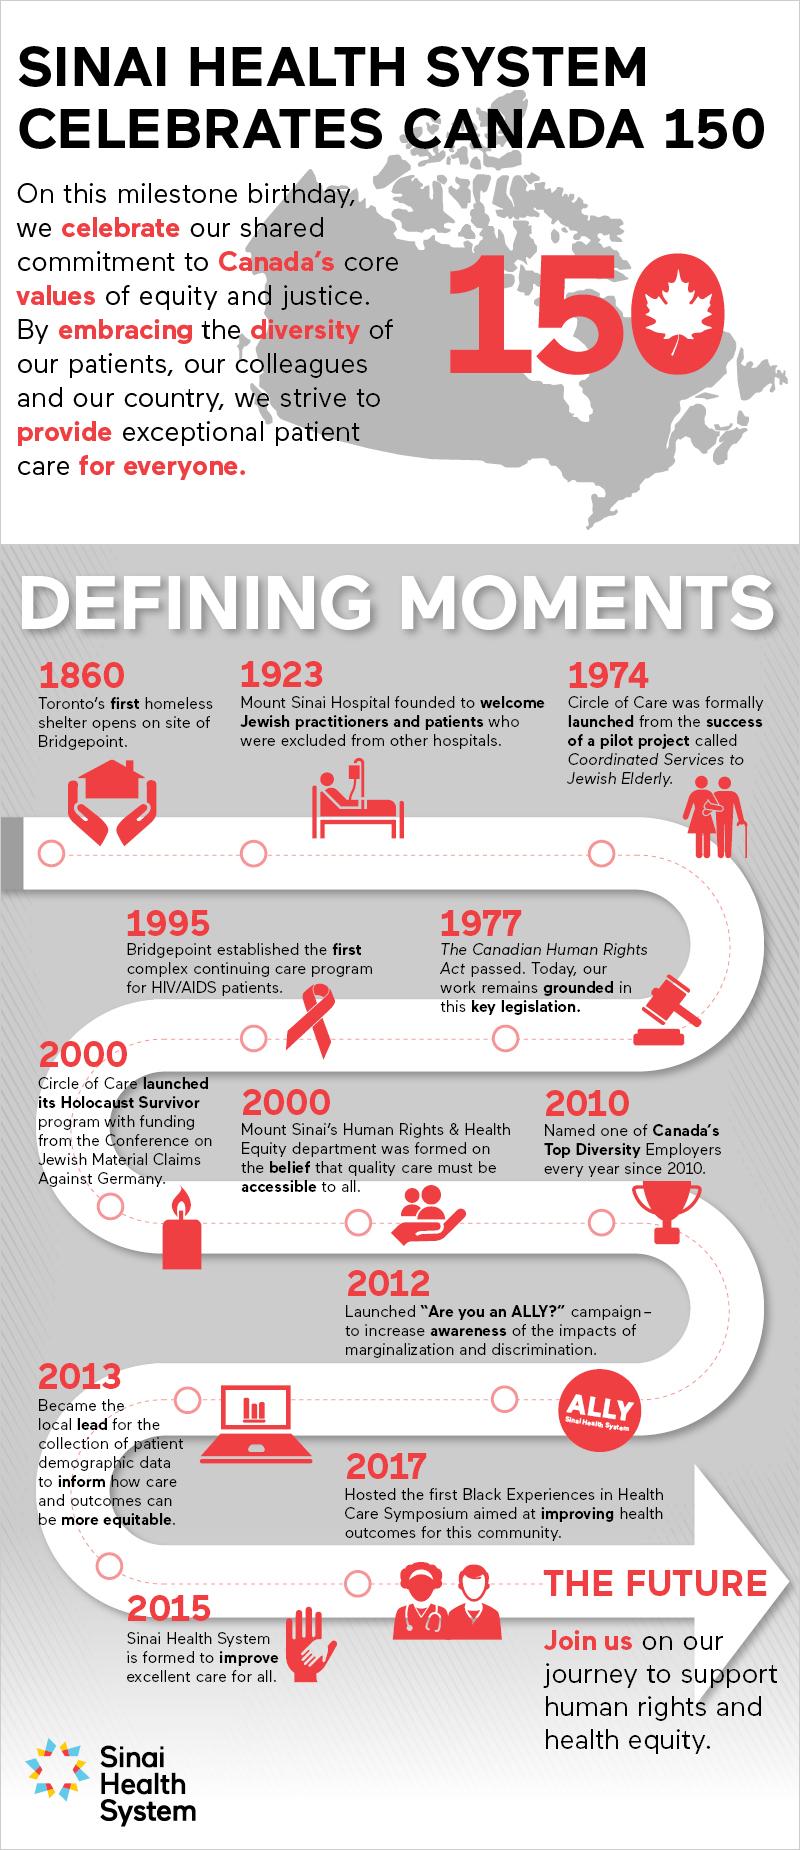 Celebrating Canada 150 Infographic